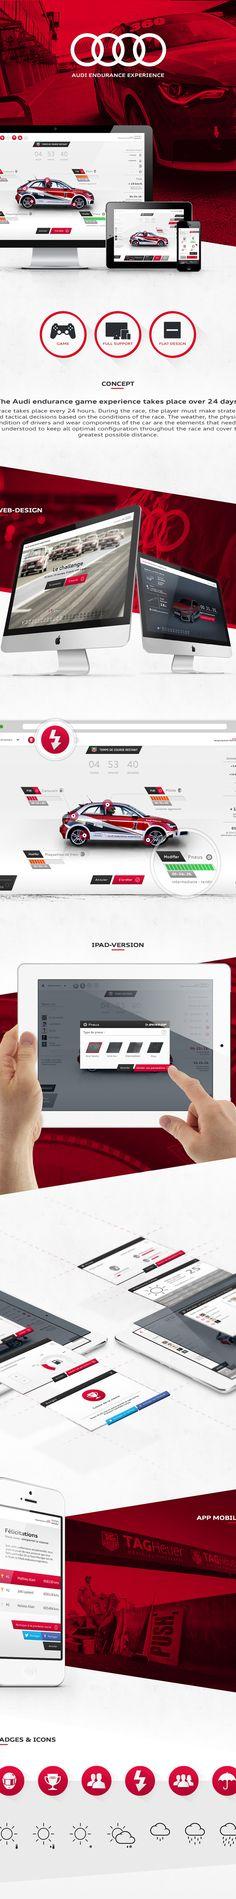 Audi Endurance Experience on Web Design Served